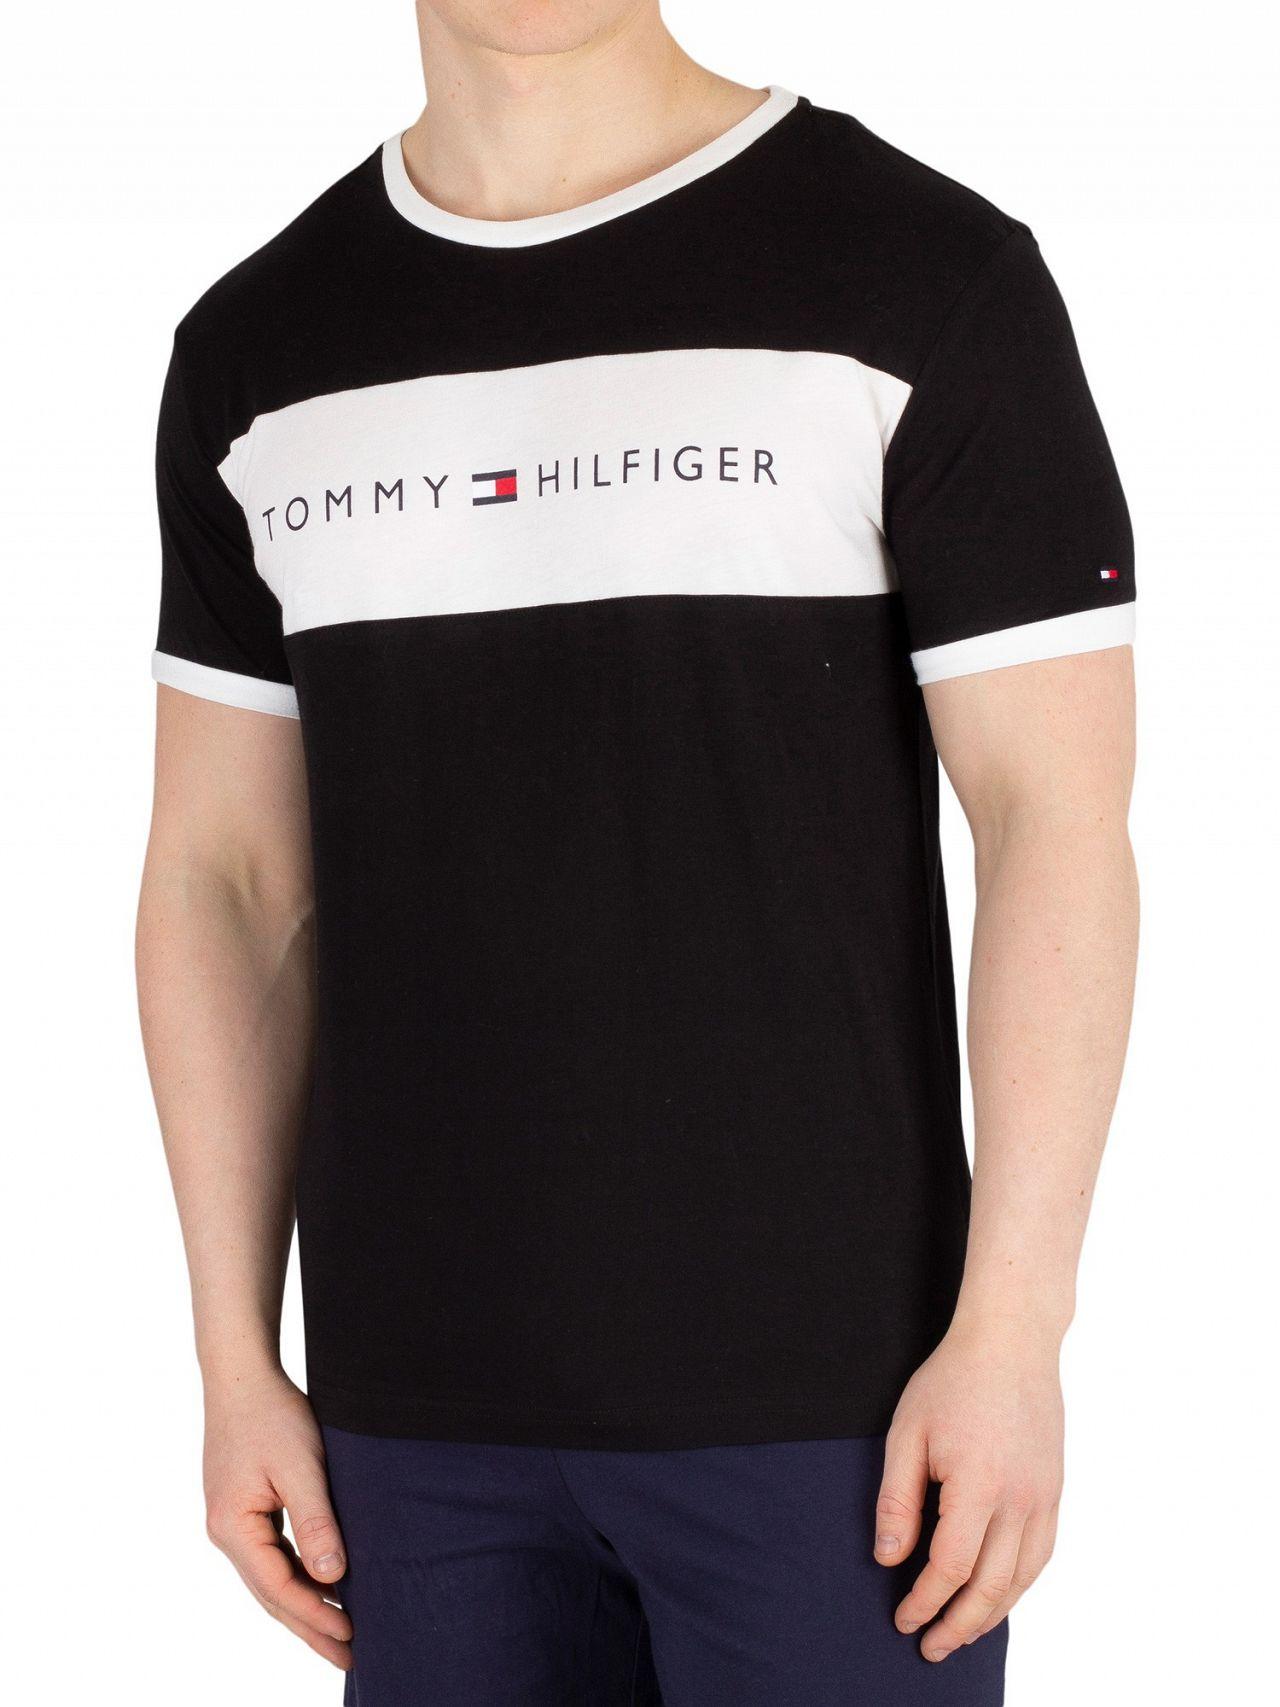 72d8e40d Tommy Hilfiger Black Logo Flag T-Shirt | Standout